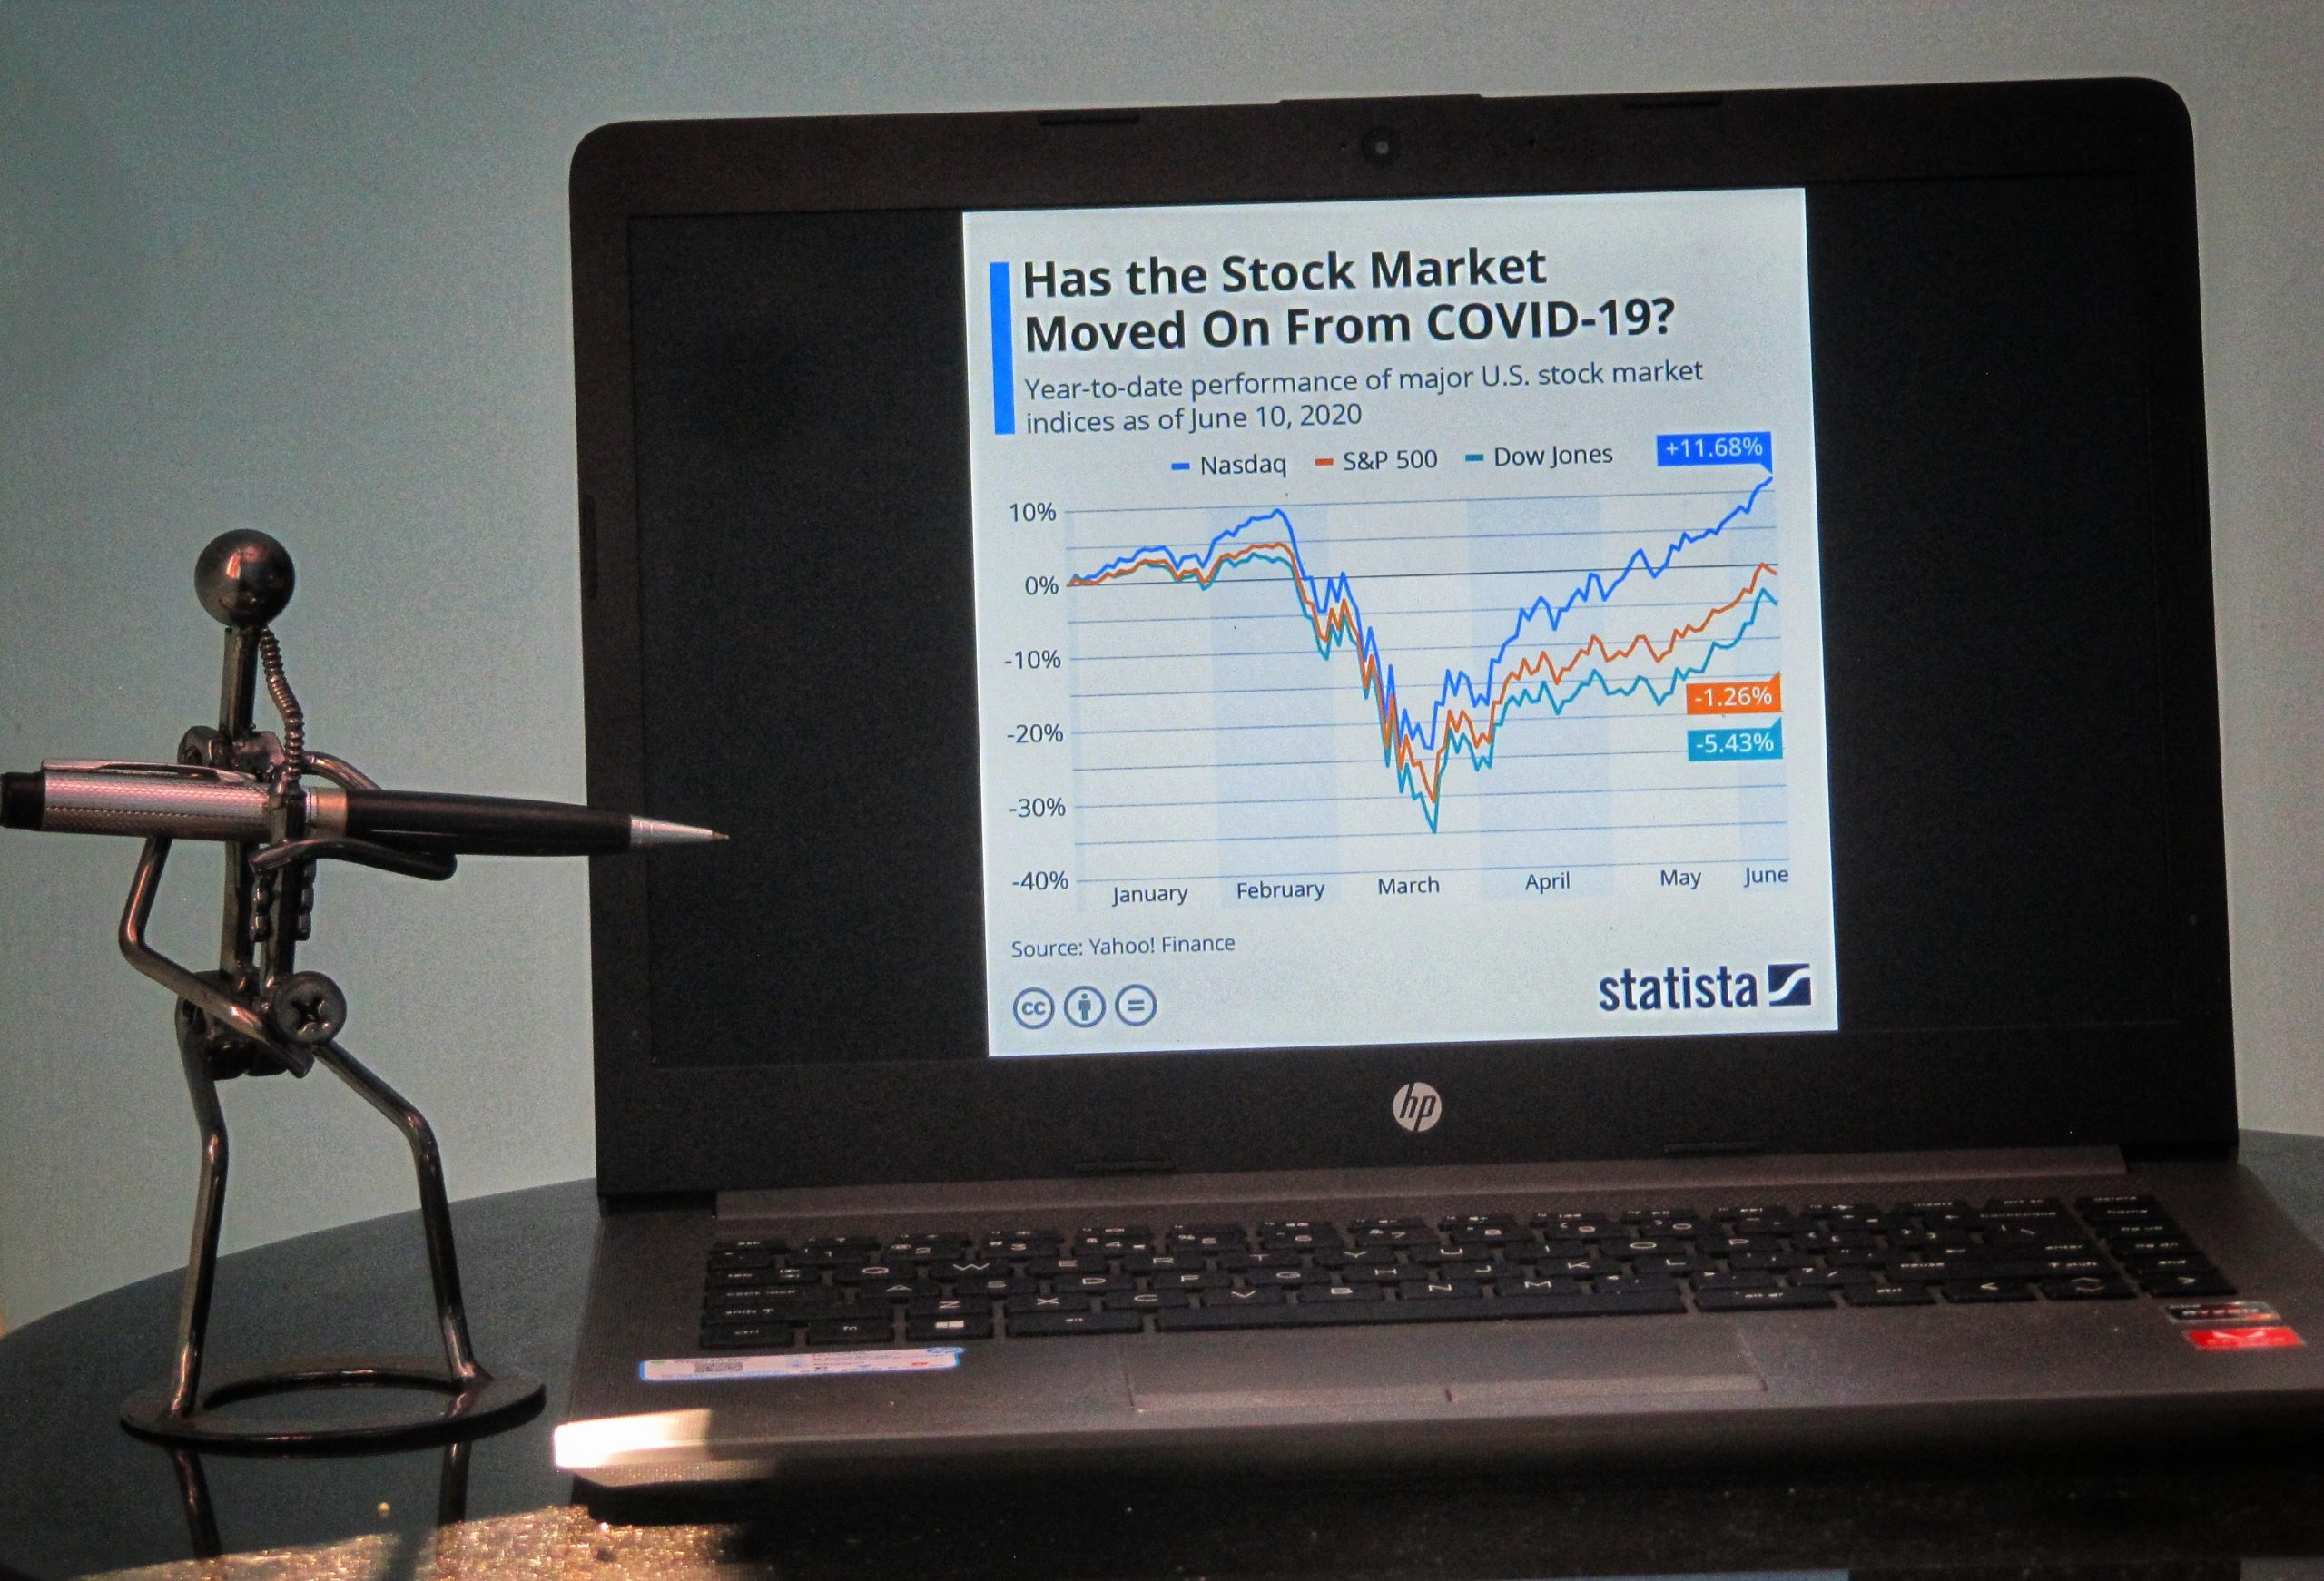 Stock market graph during corona period